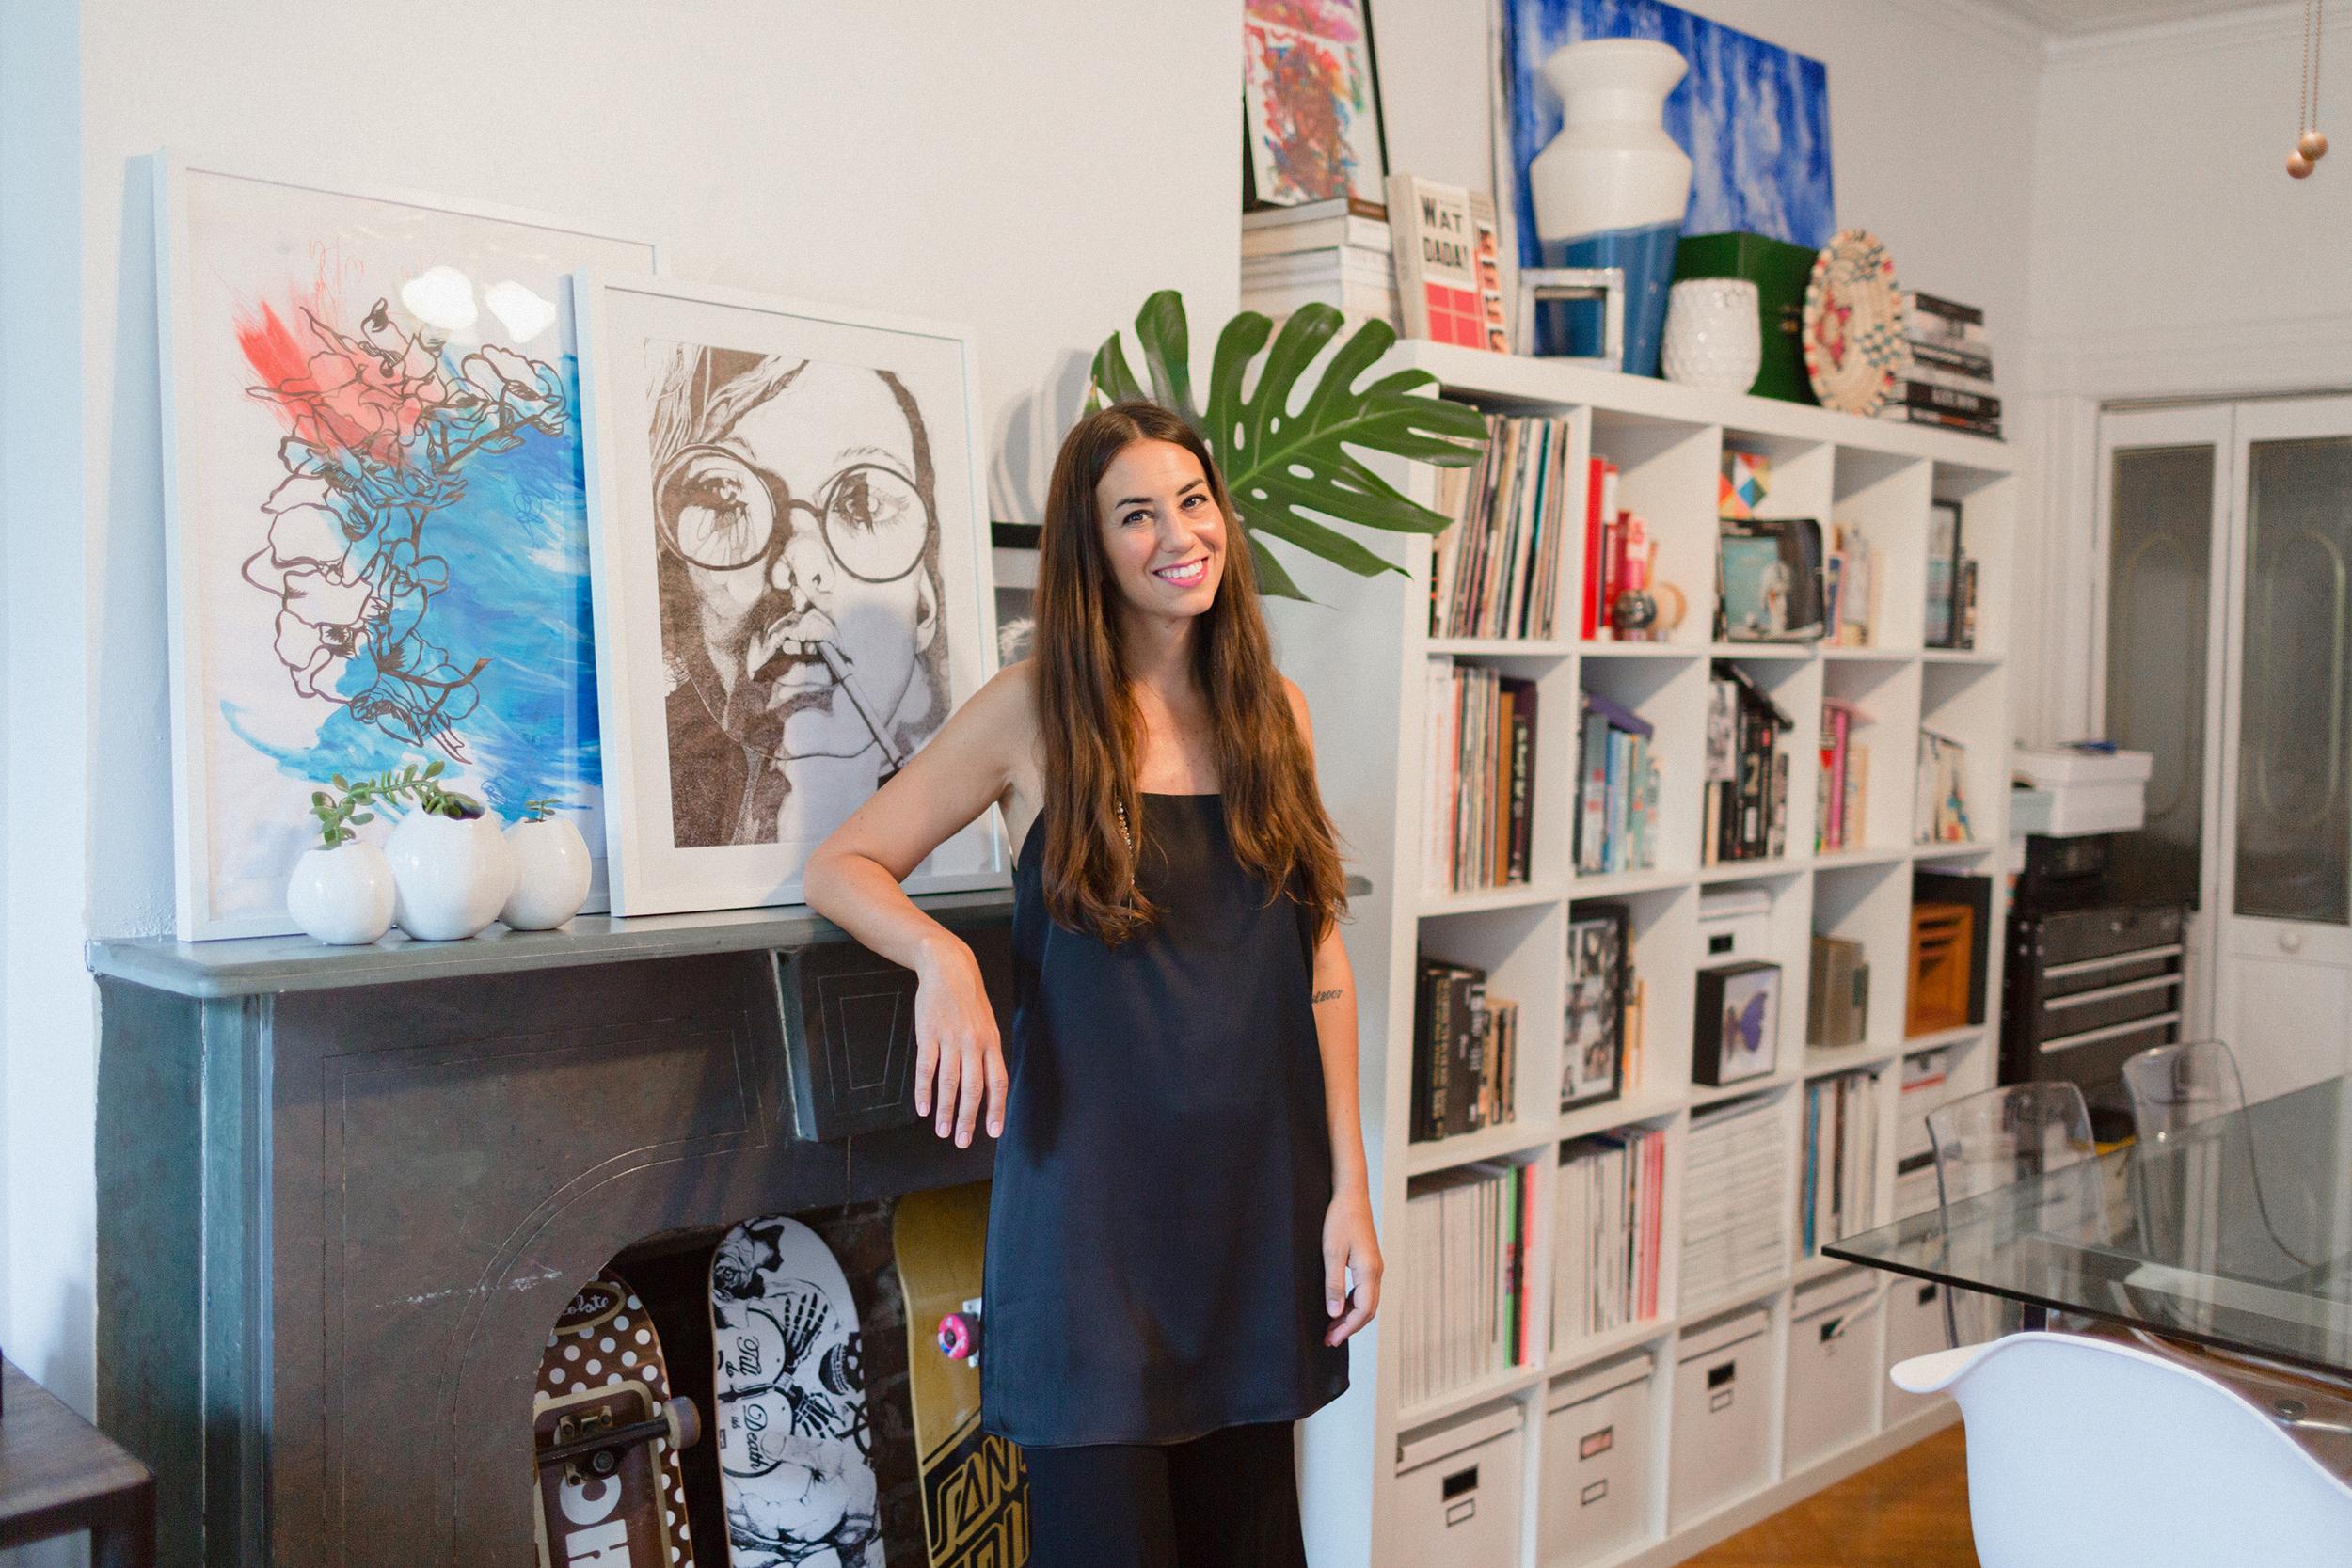 Amanda Assad Mounser, founder of MOUNSER